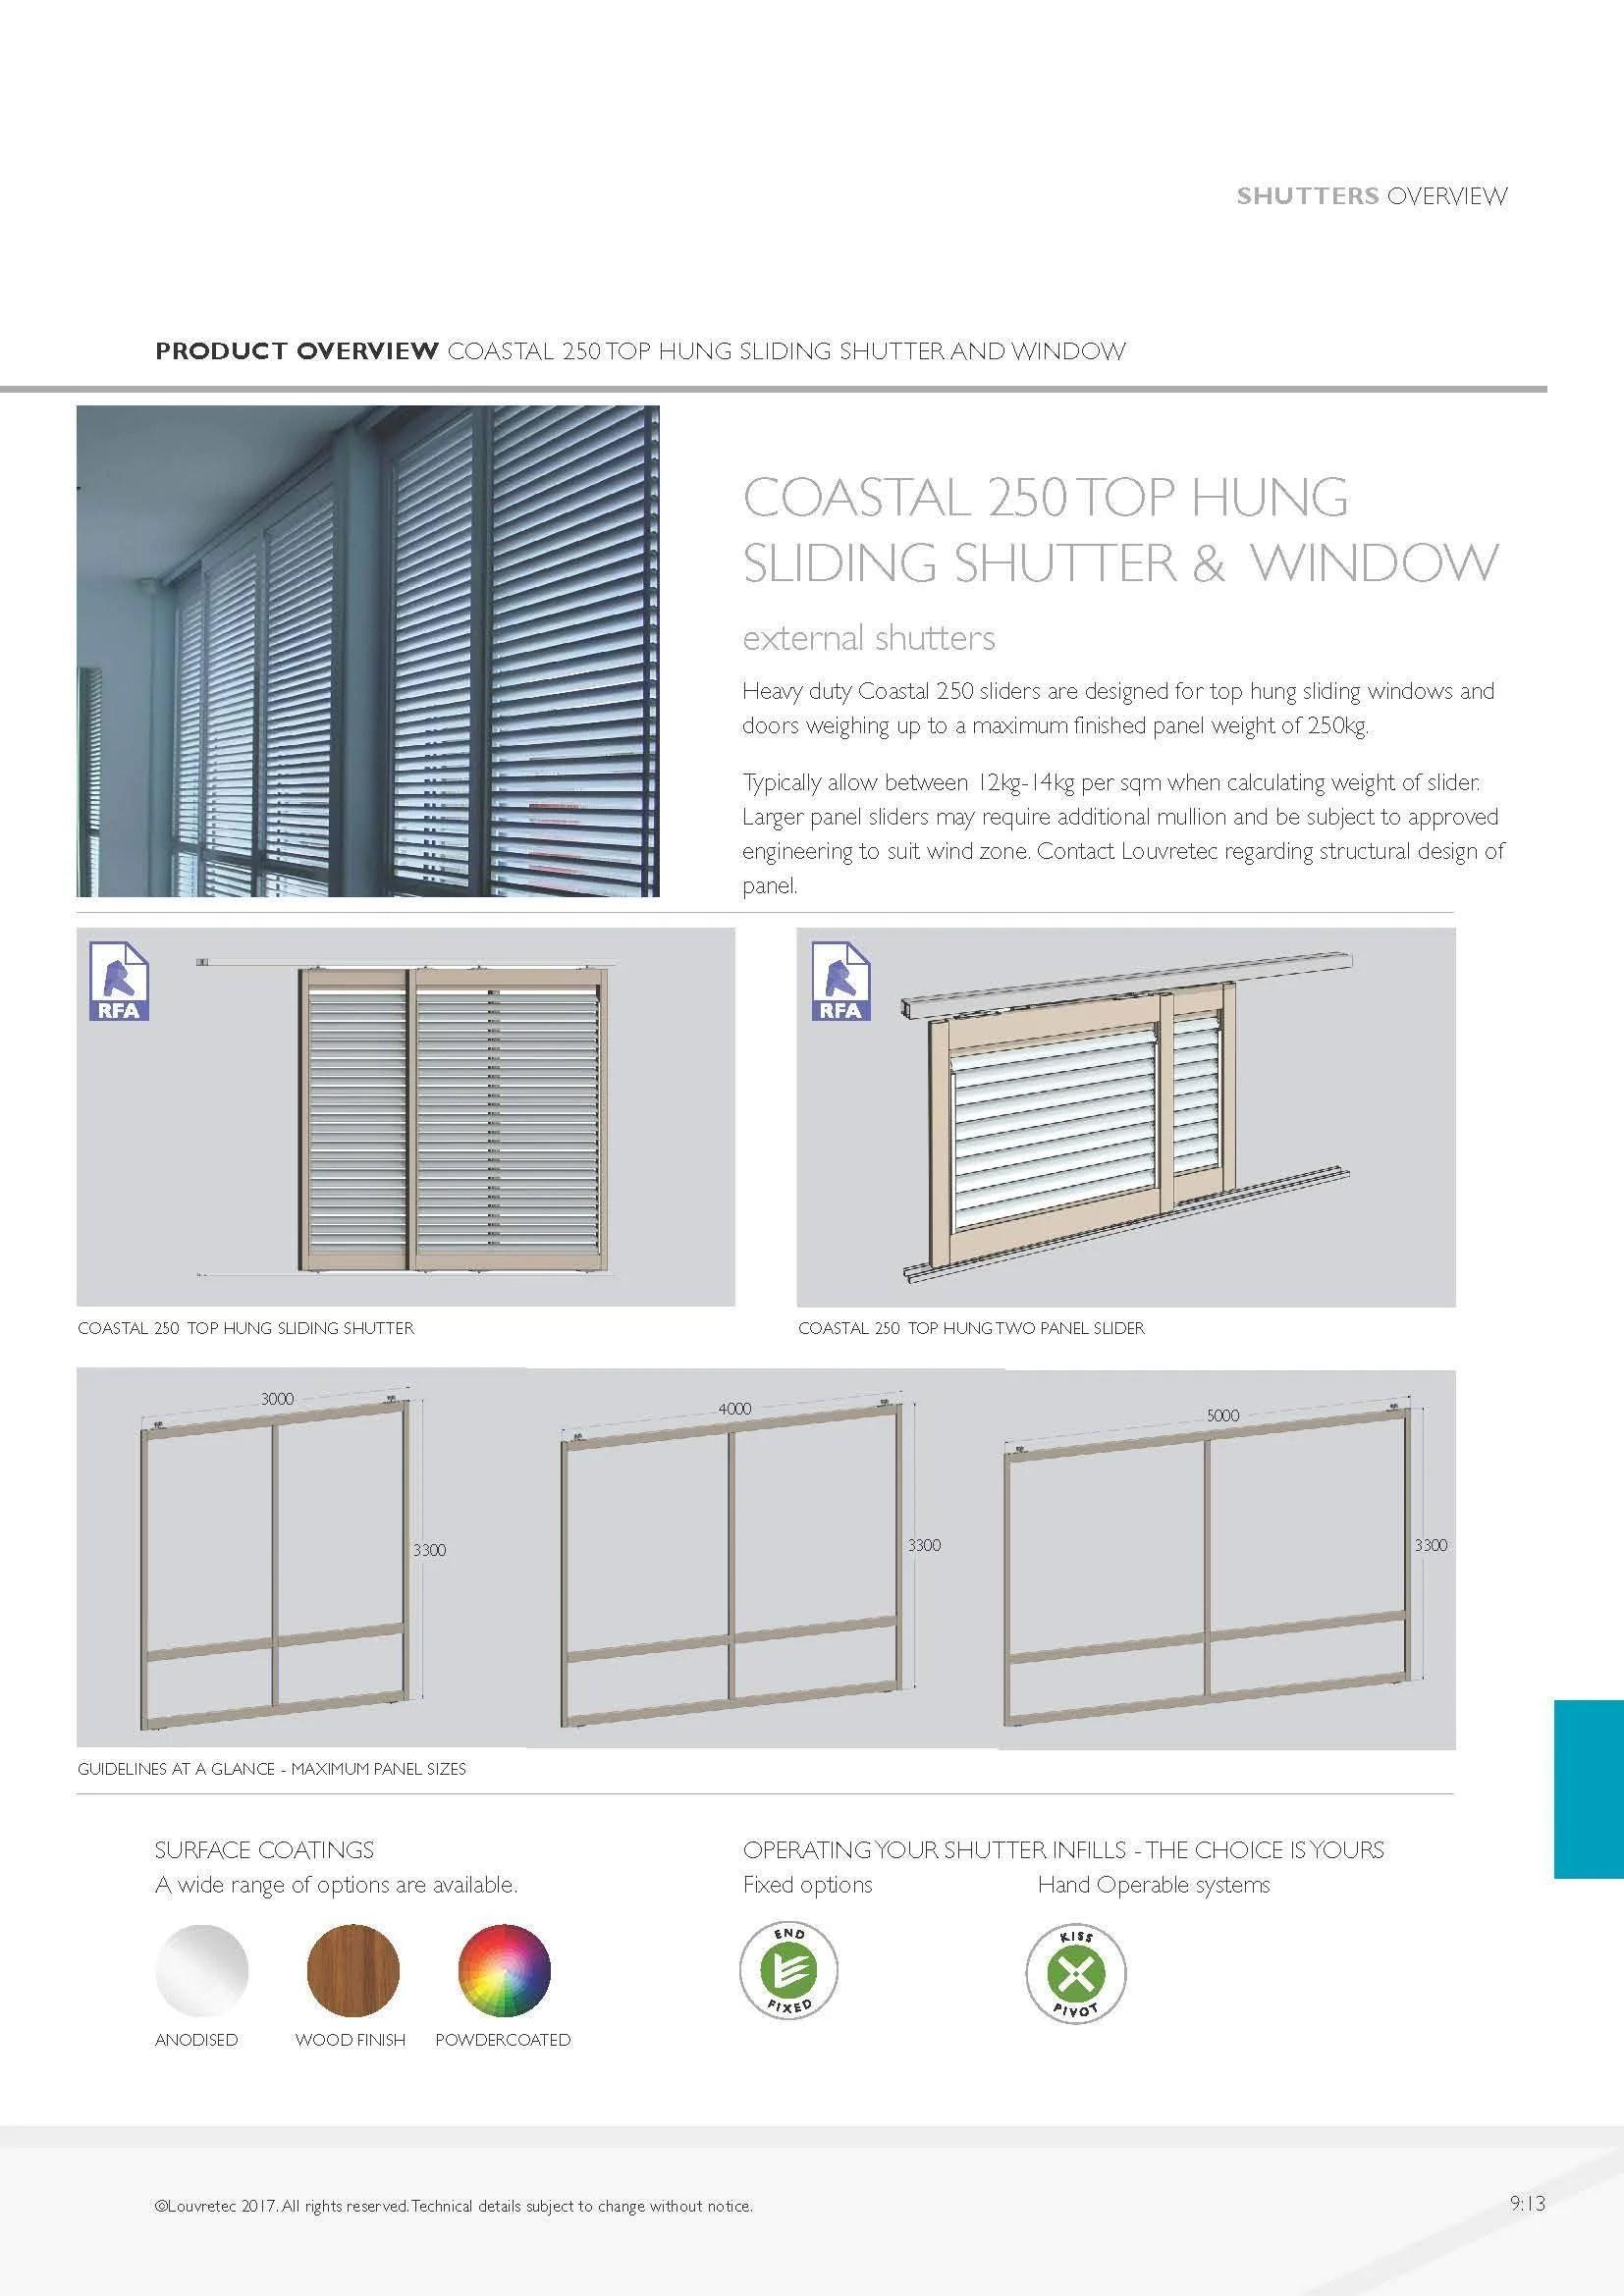 Louvretec Australia Technical Sliding Door Systems